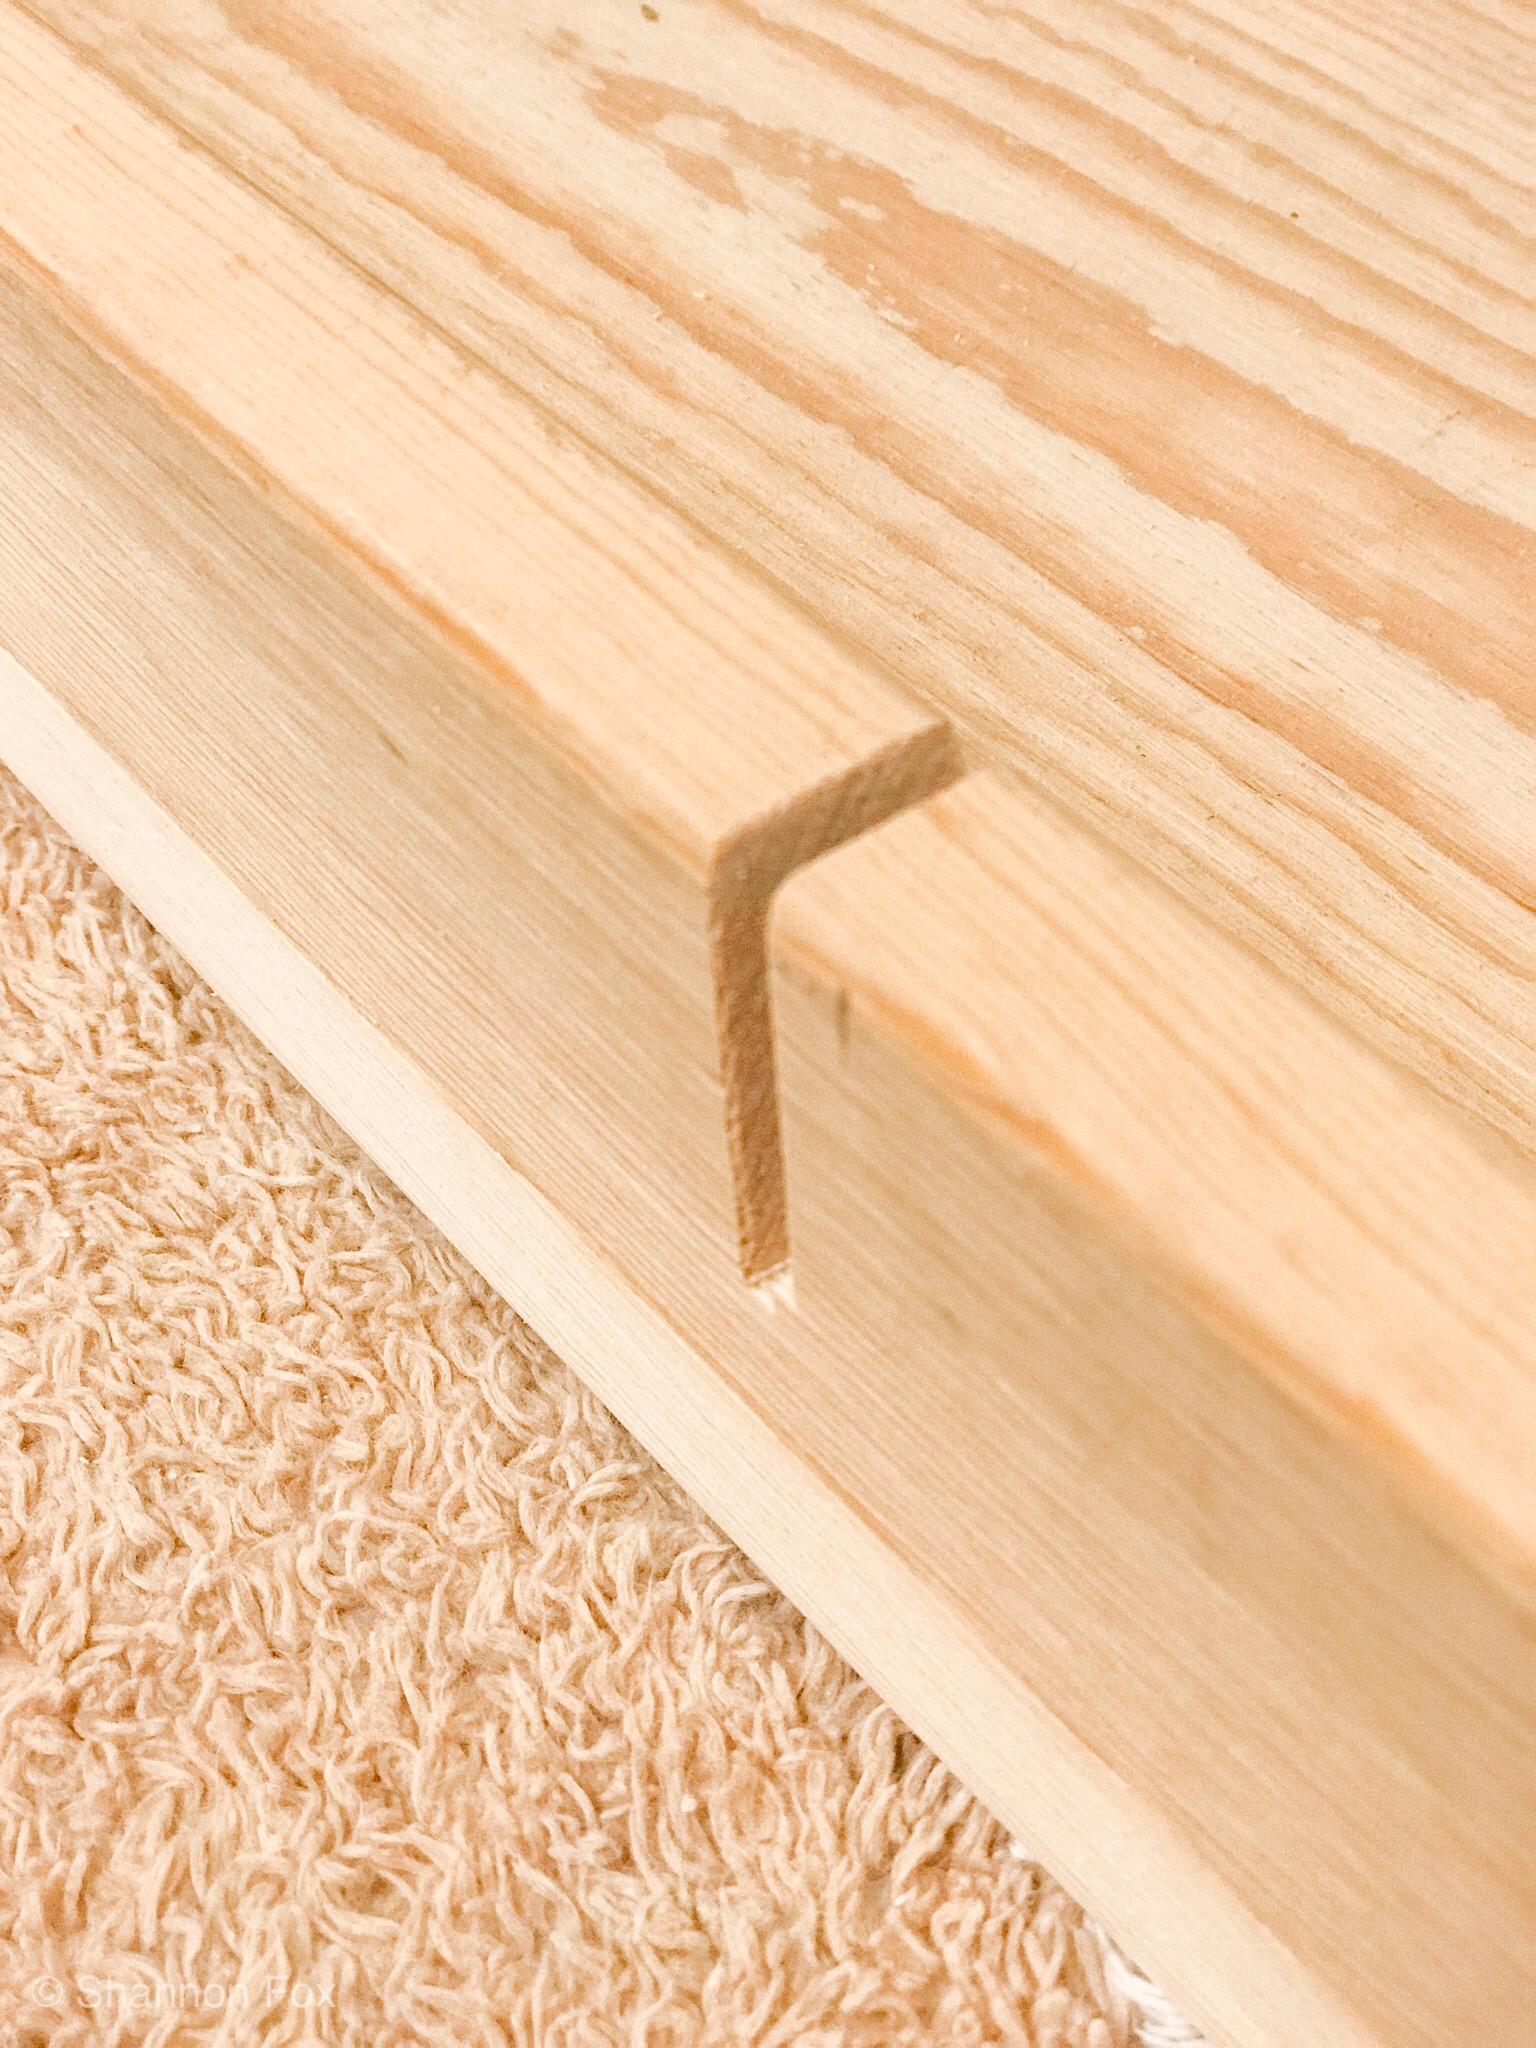 How To Make And Hang A Chunky Wood Wall Shelf